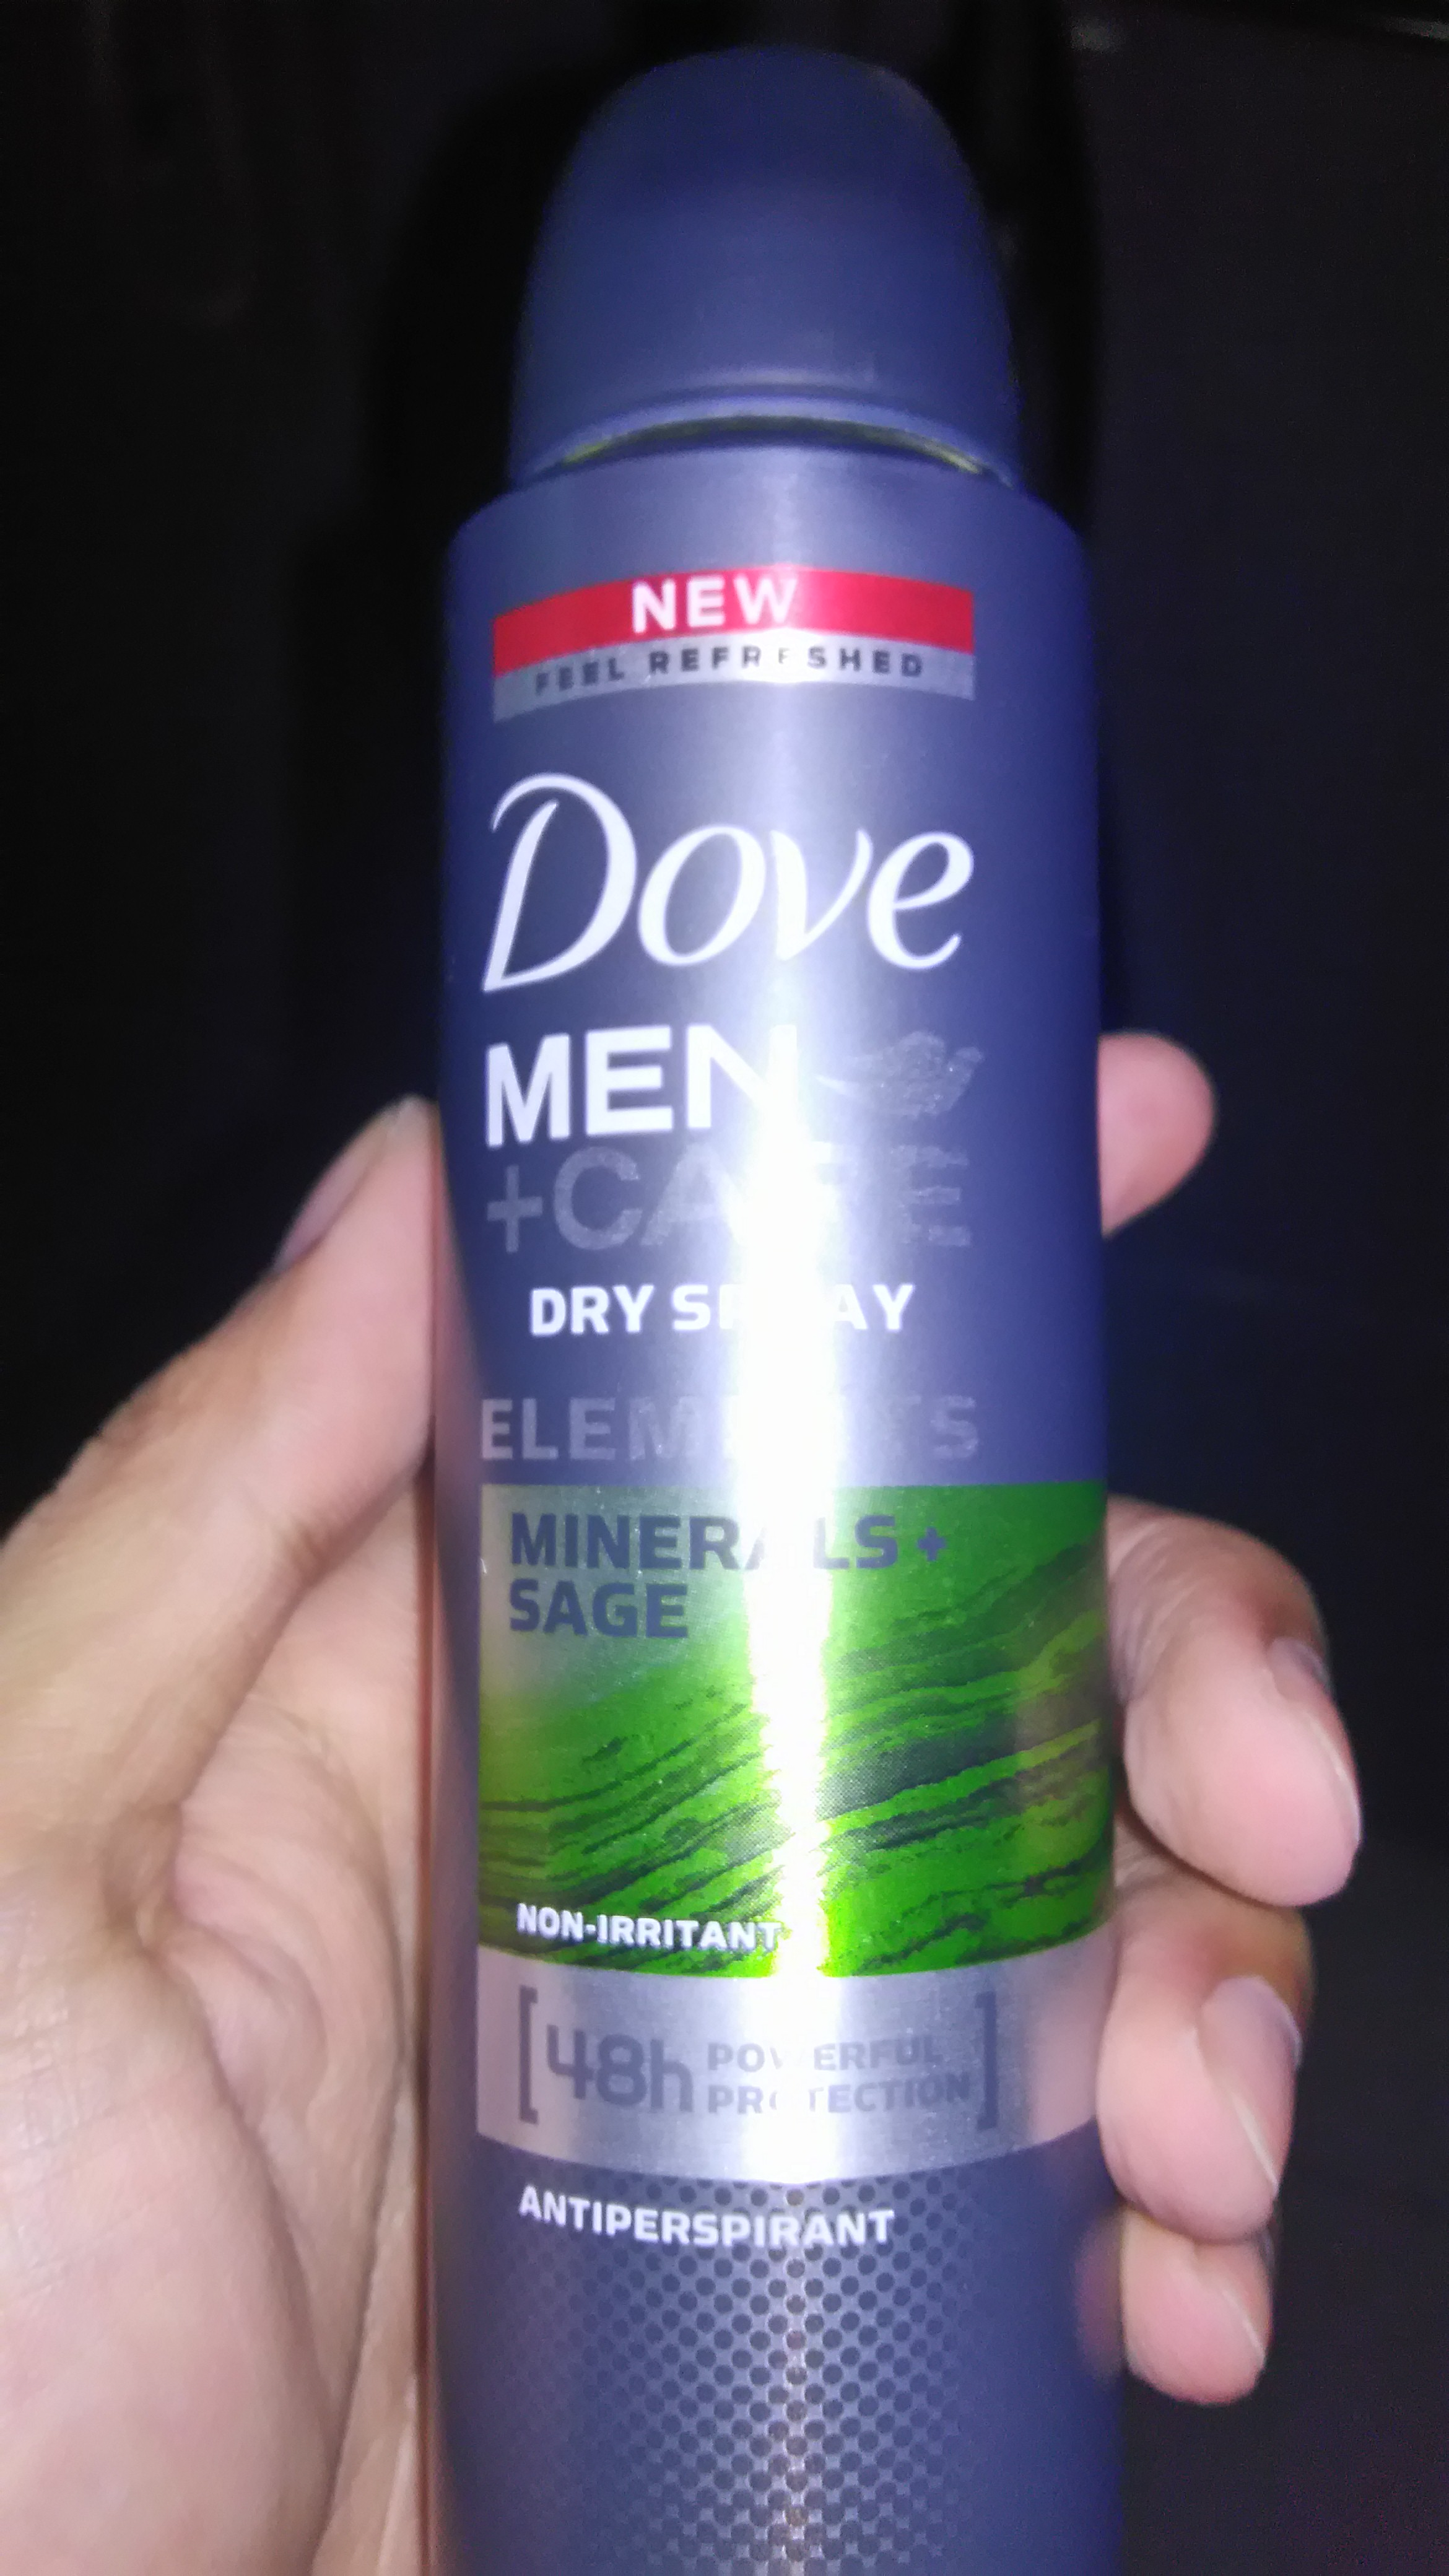 Dove Men+Care Elements Minerals and Sage Antiperspirant uploaded by Jade T.